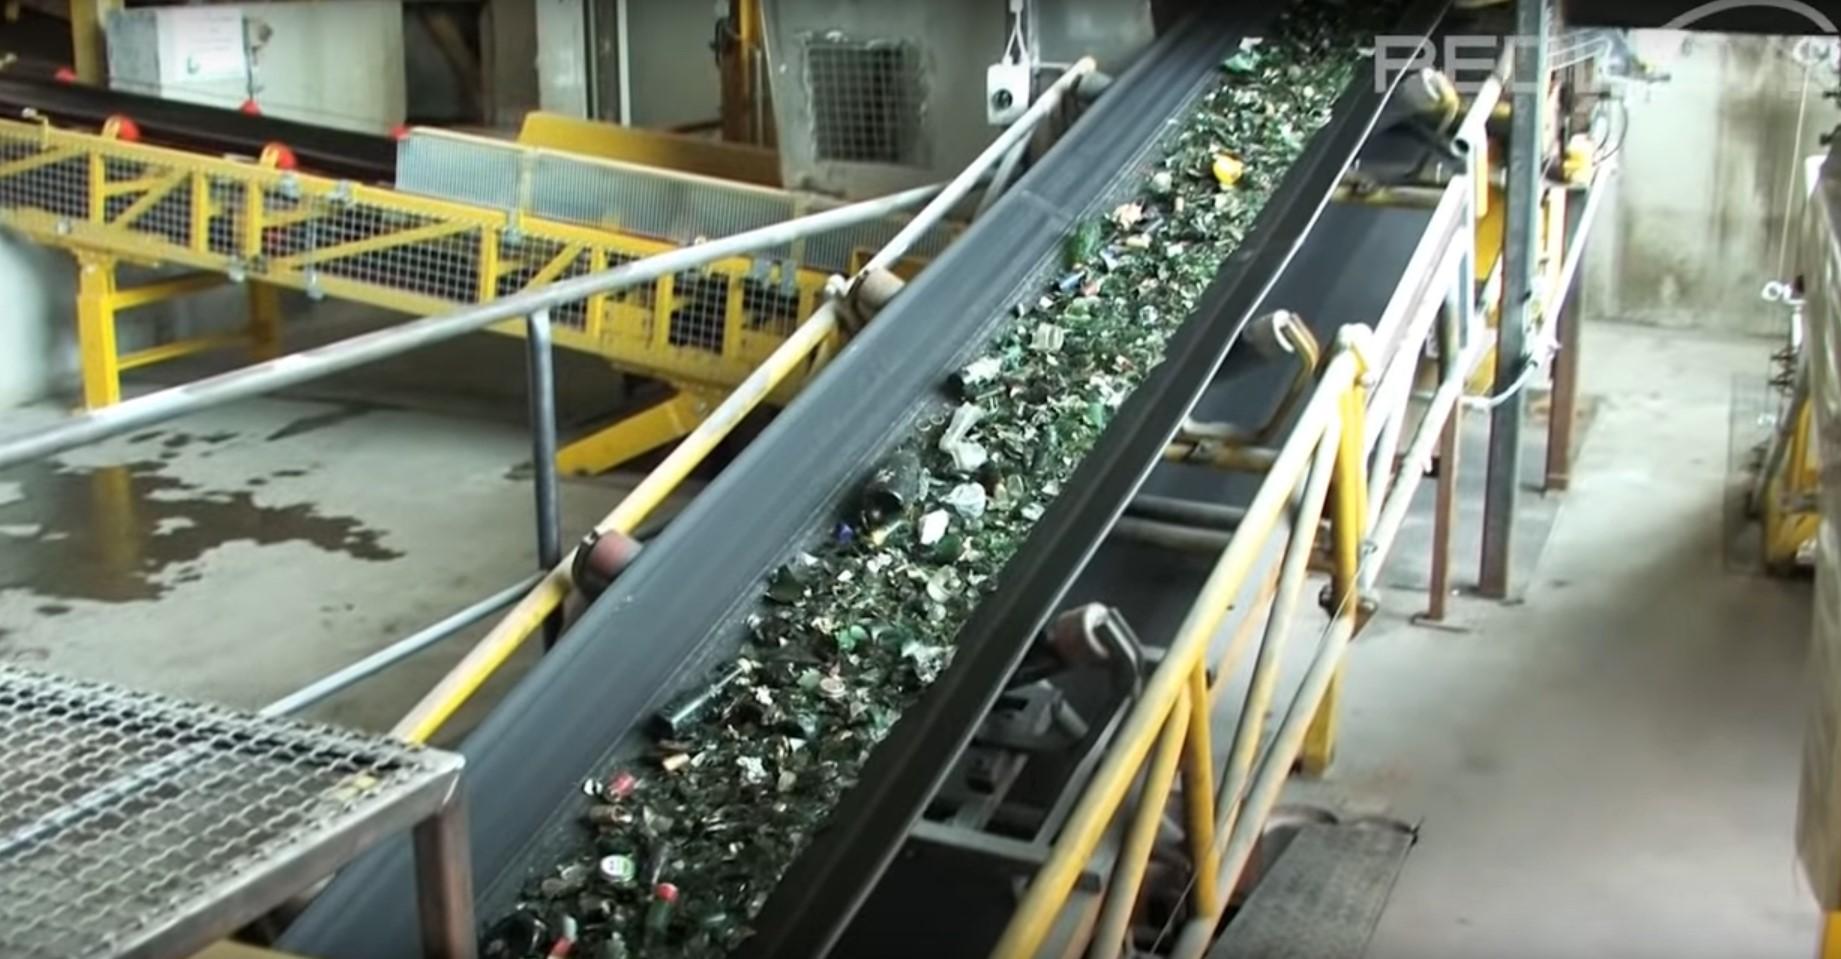 recyclingsproces van glas